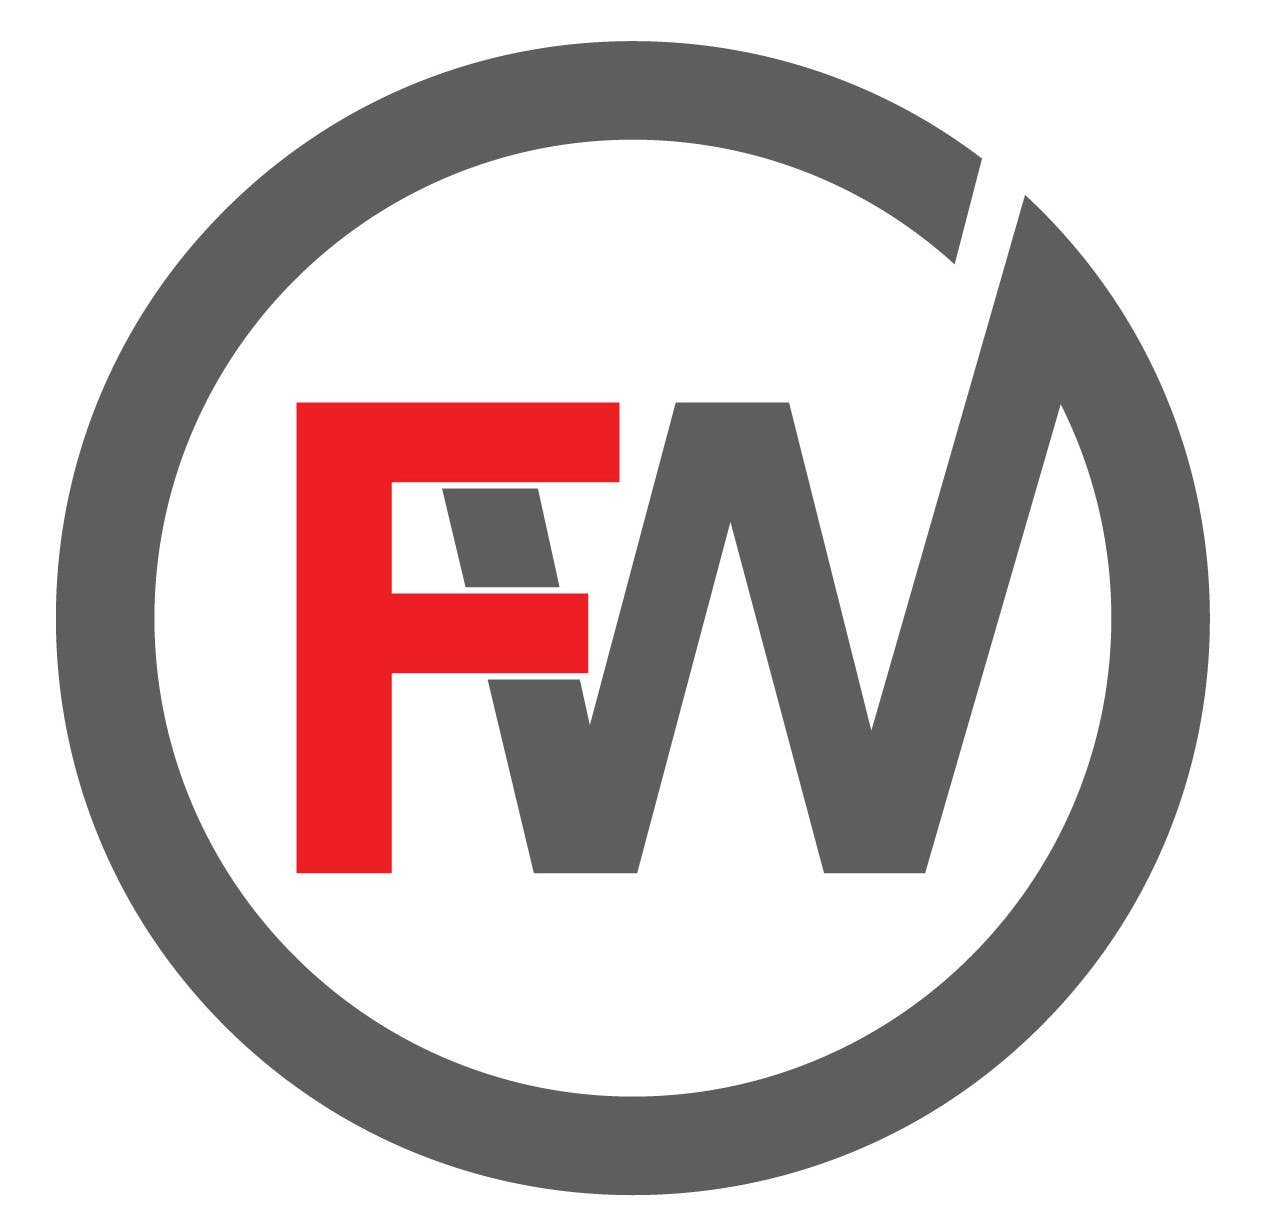 FrontWest Customs Brokerage & Services LLC